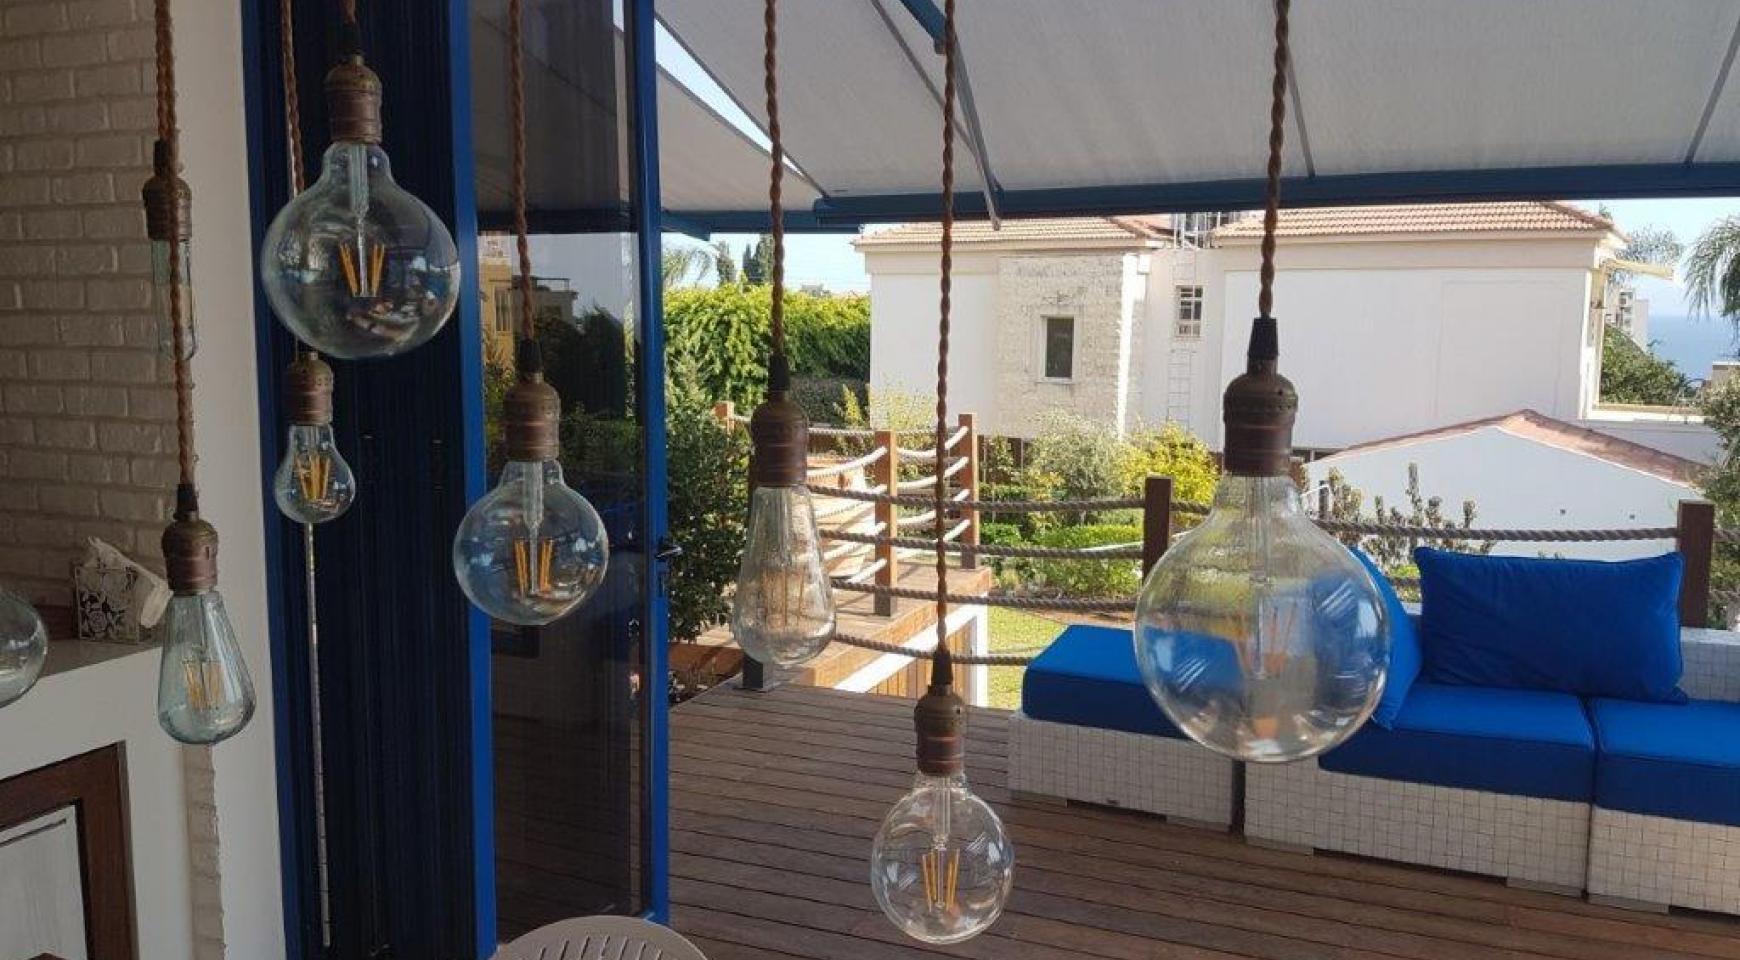 5-Спальная Вилла с видом на Море в районе  Agios Tychonas - 7